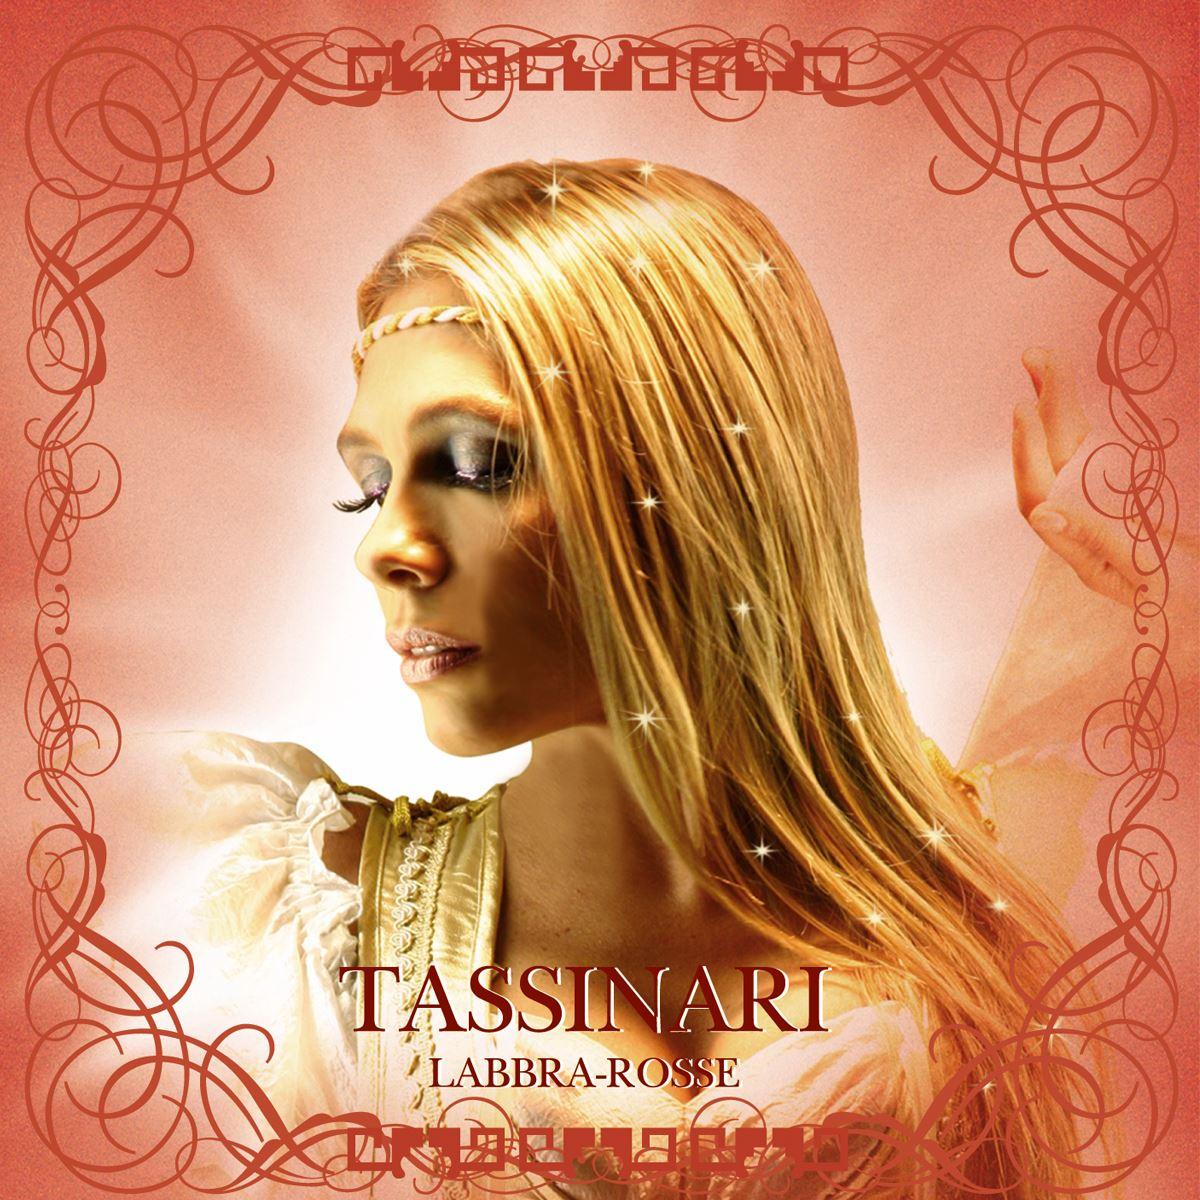 CD Tassinari-Labbra Rose